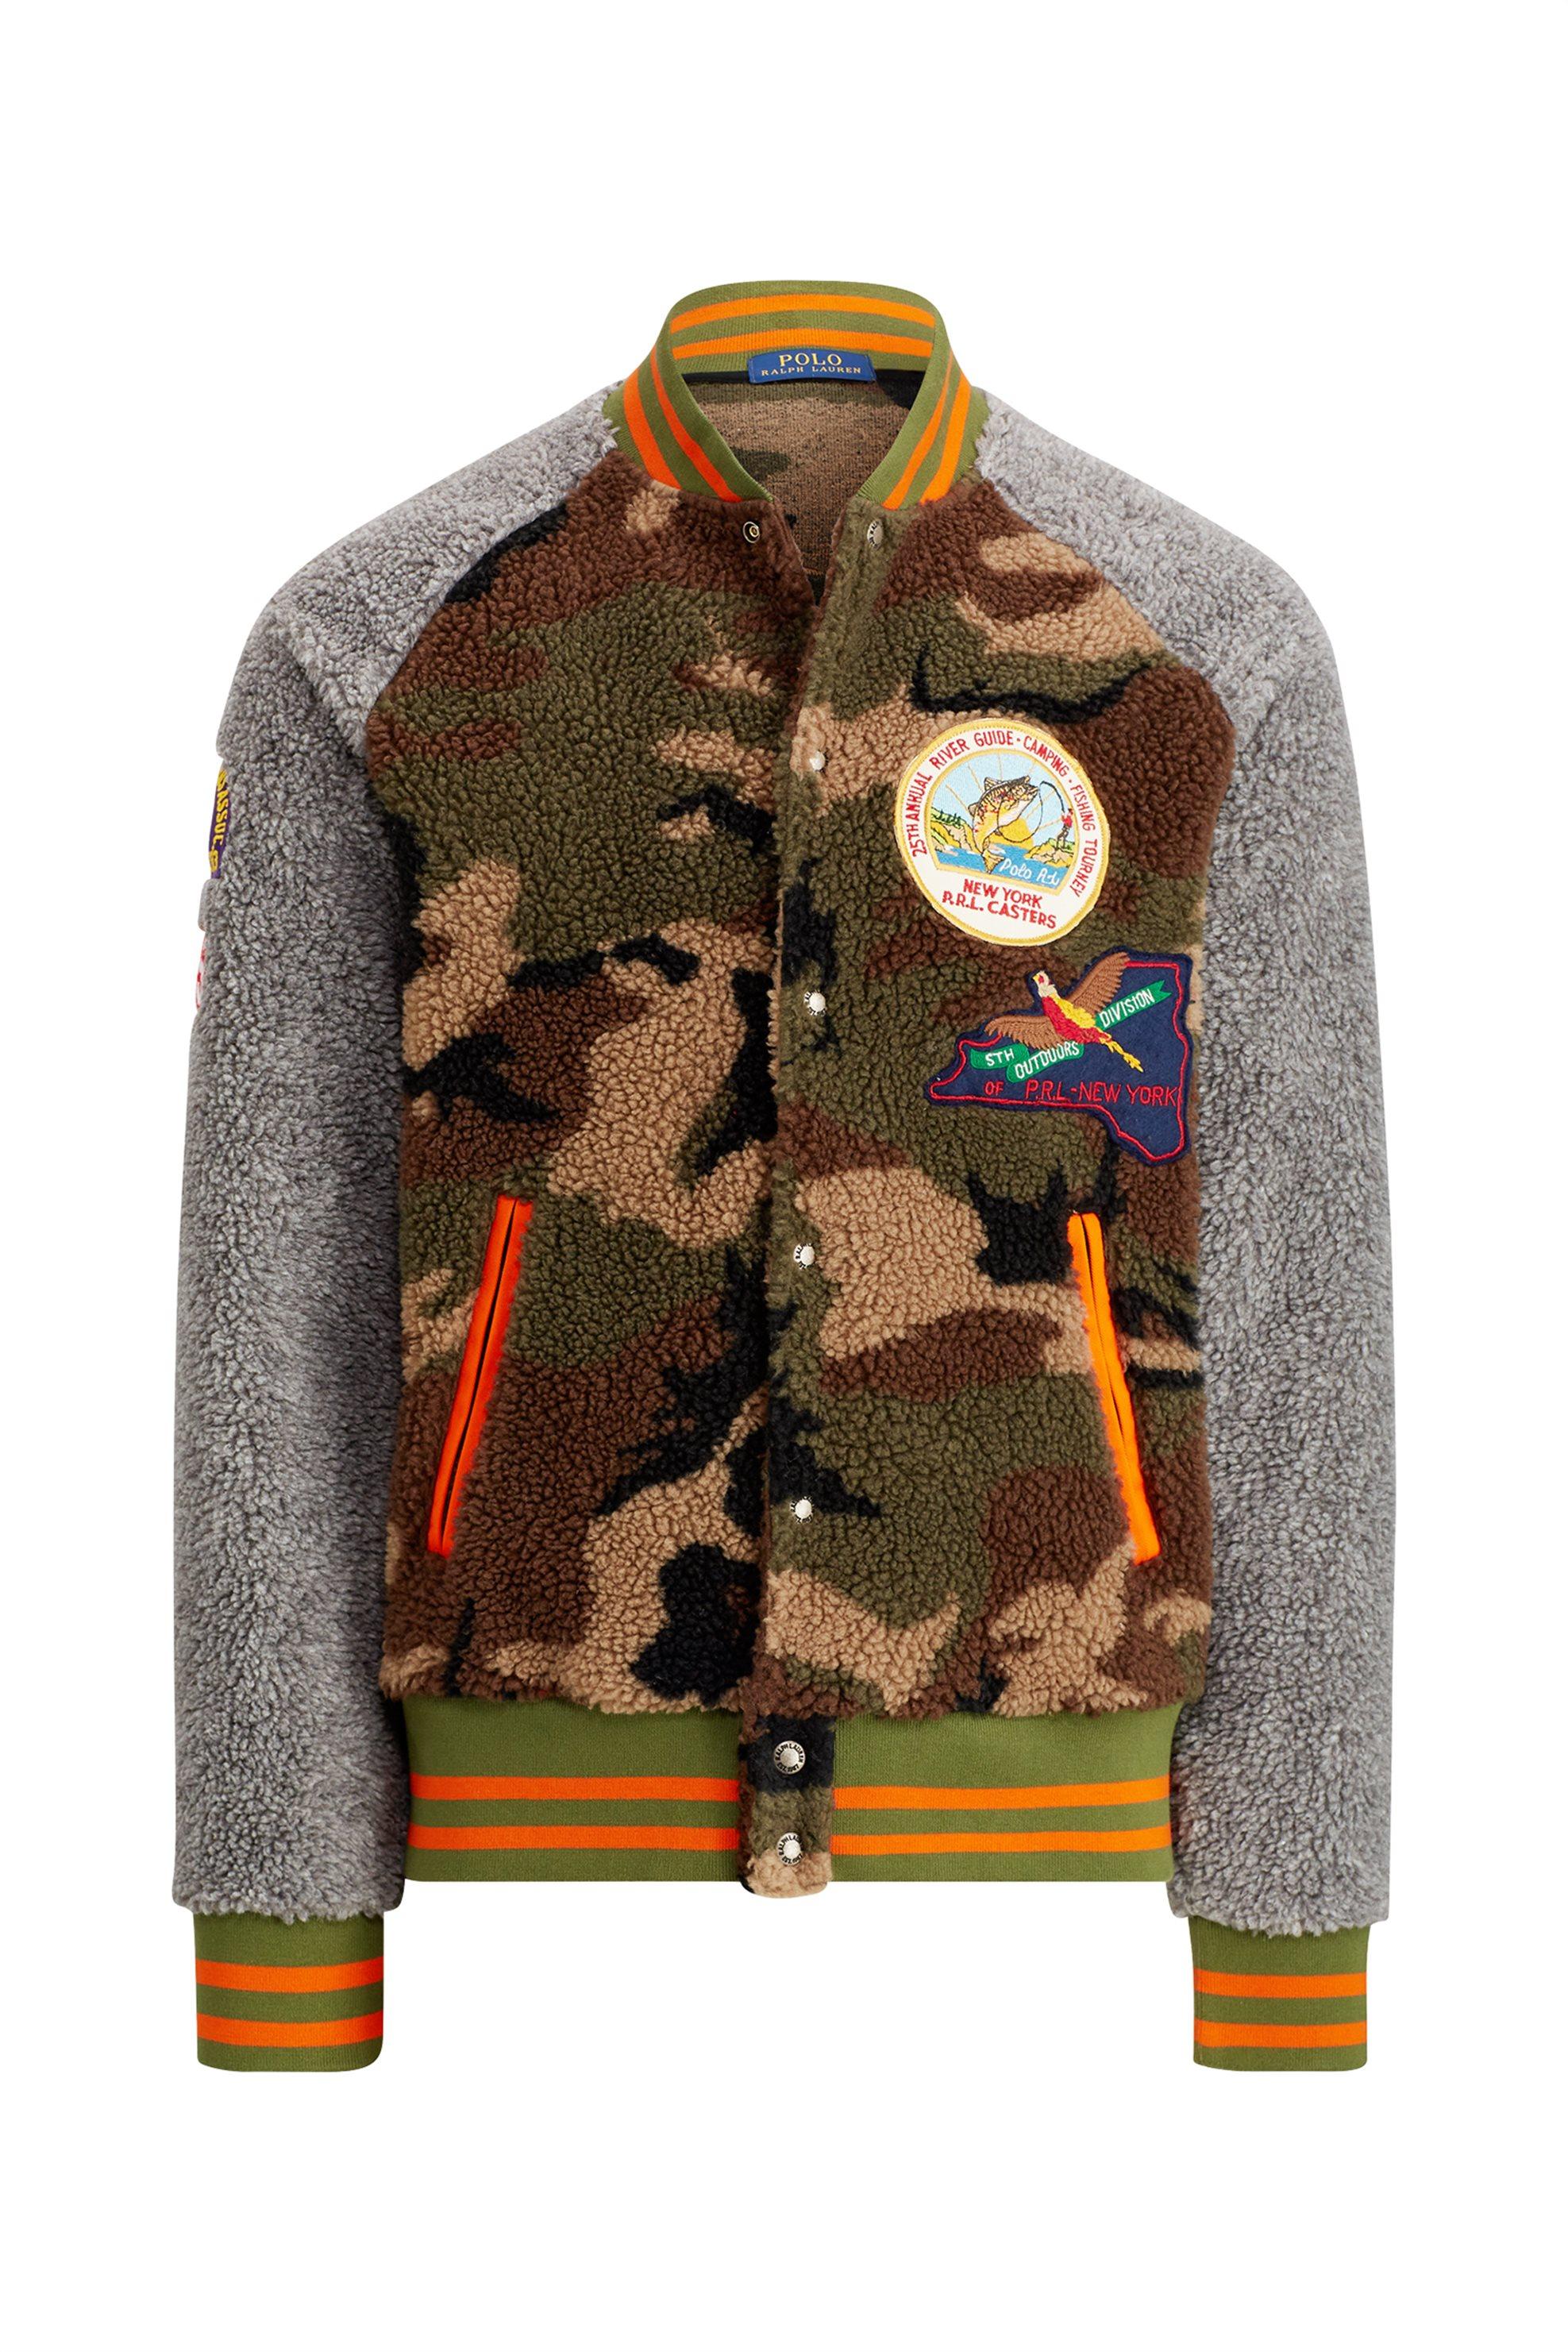 90bc3daac457 Polo Ralph Lauren ανδρικό bomber Camo Fleece Baseball Jacket - 710731678001  - Χακί